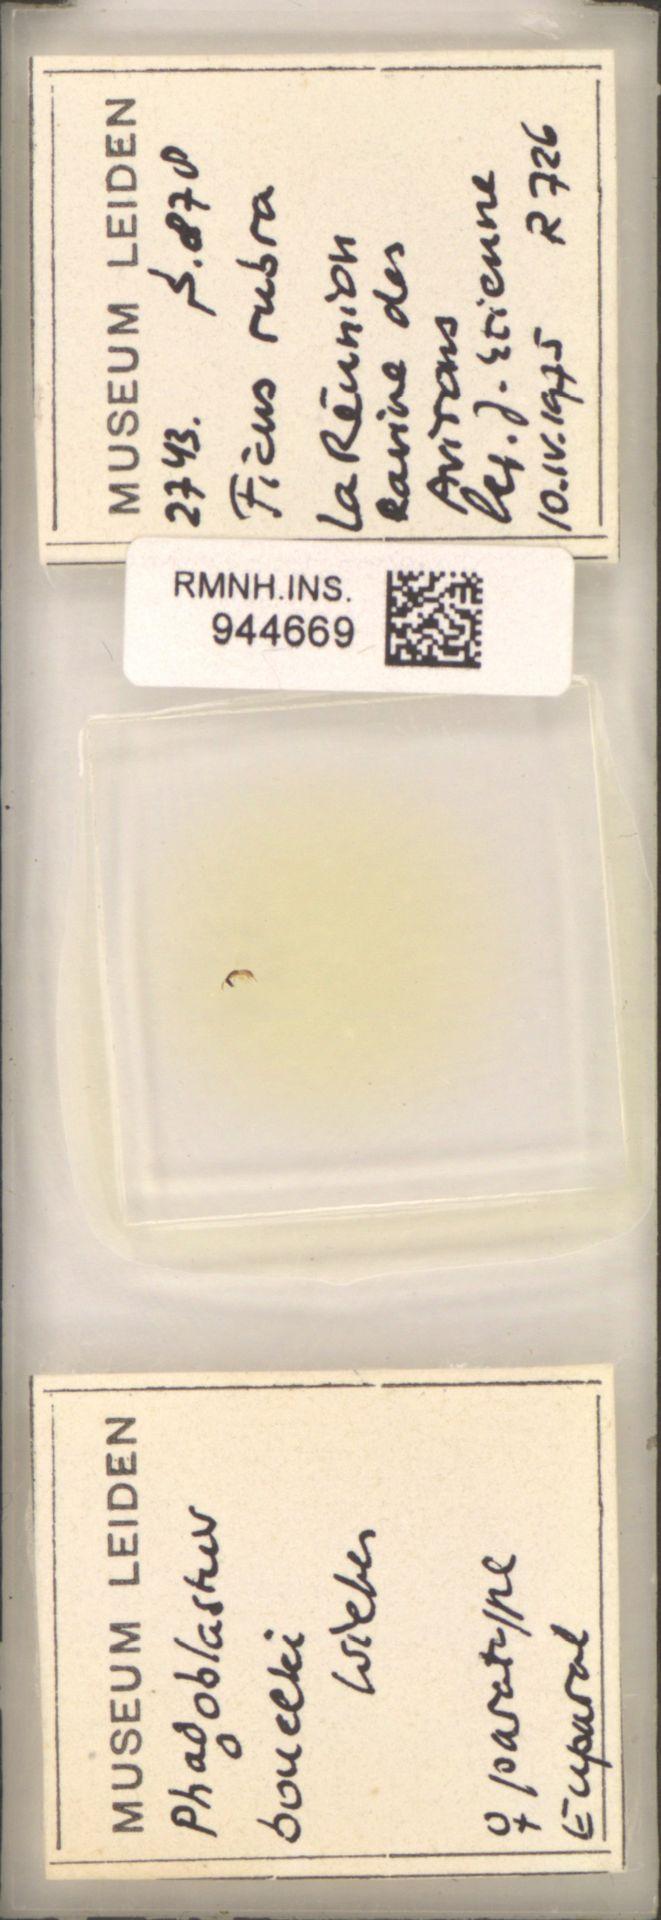 RMNH.INS.944669 | Phagoblastus bouceki Wiebes